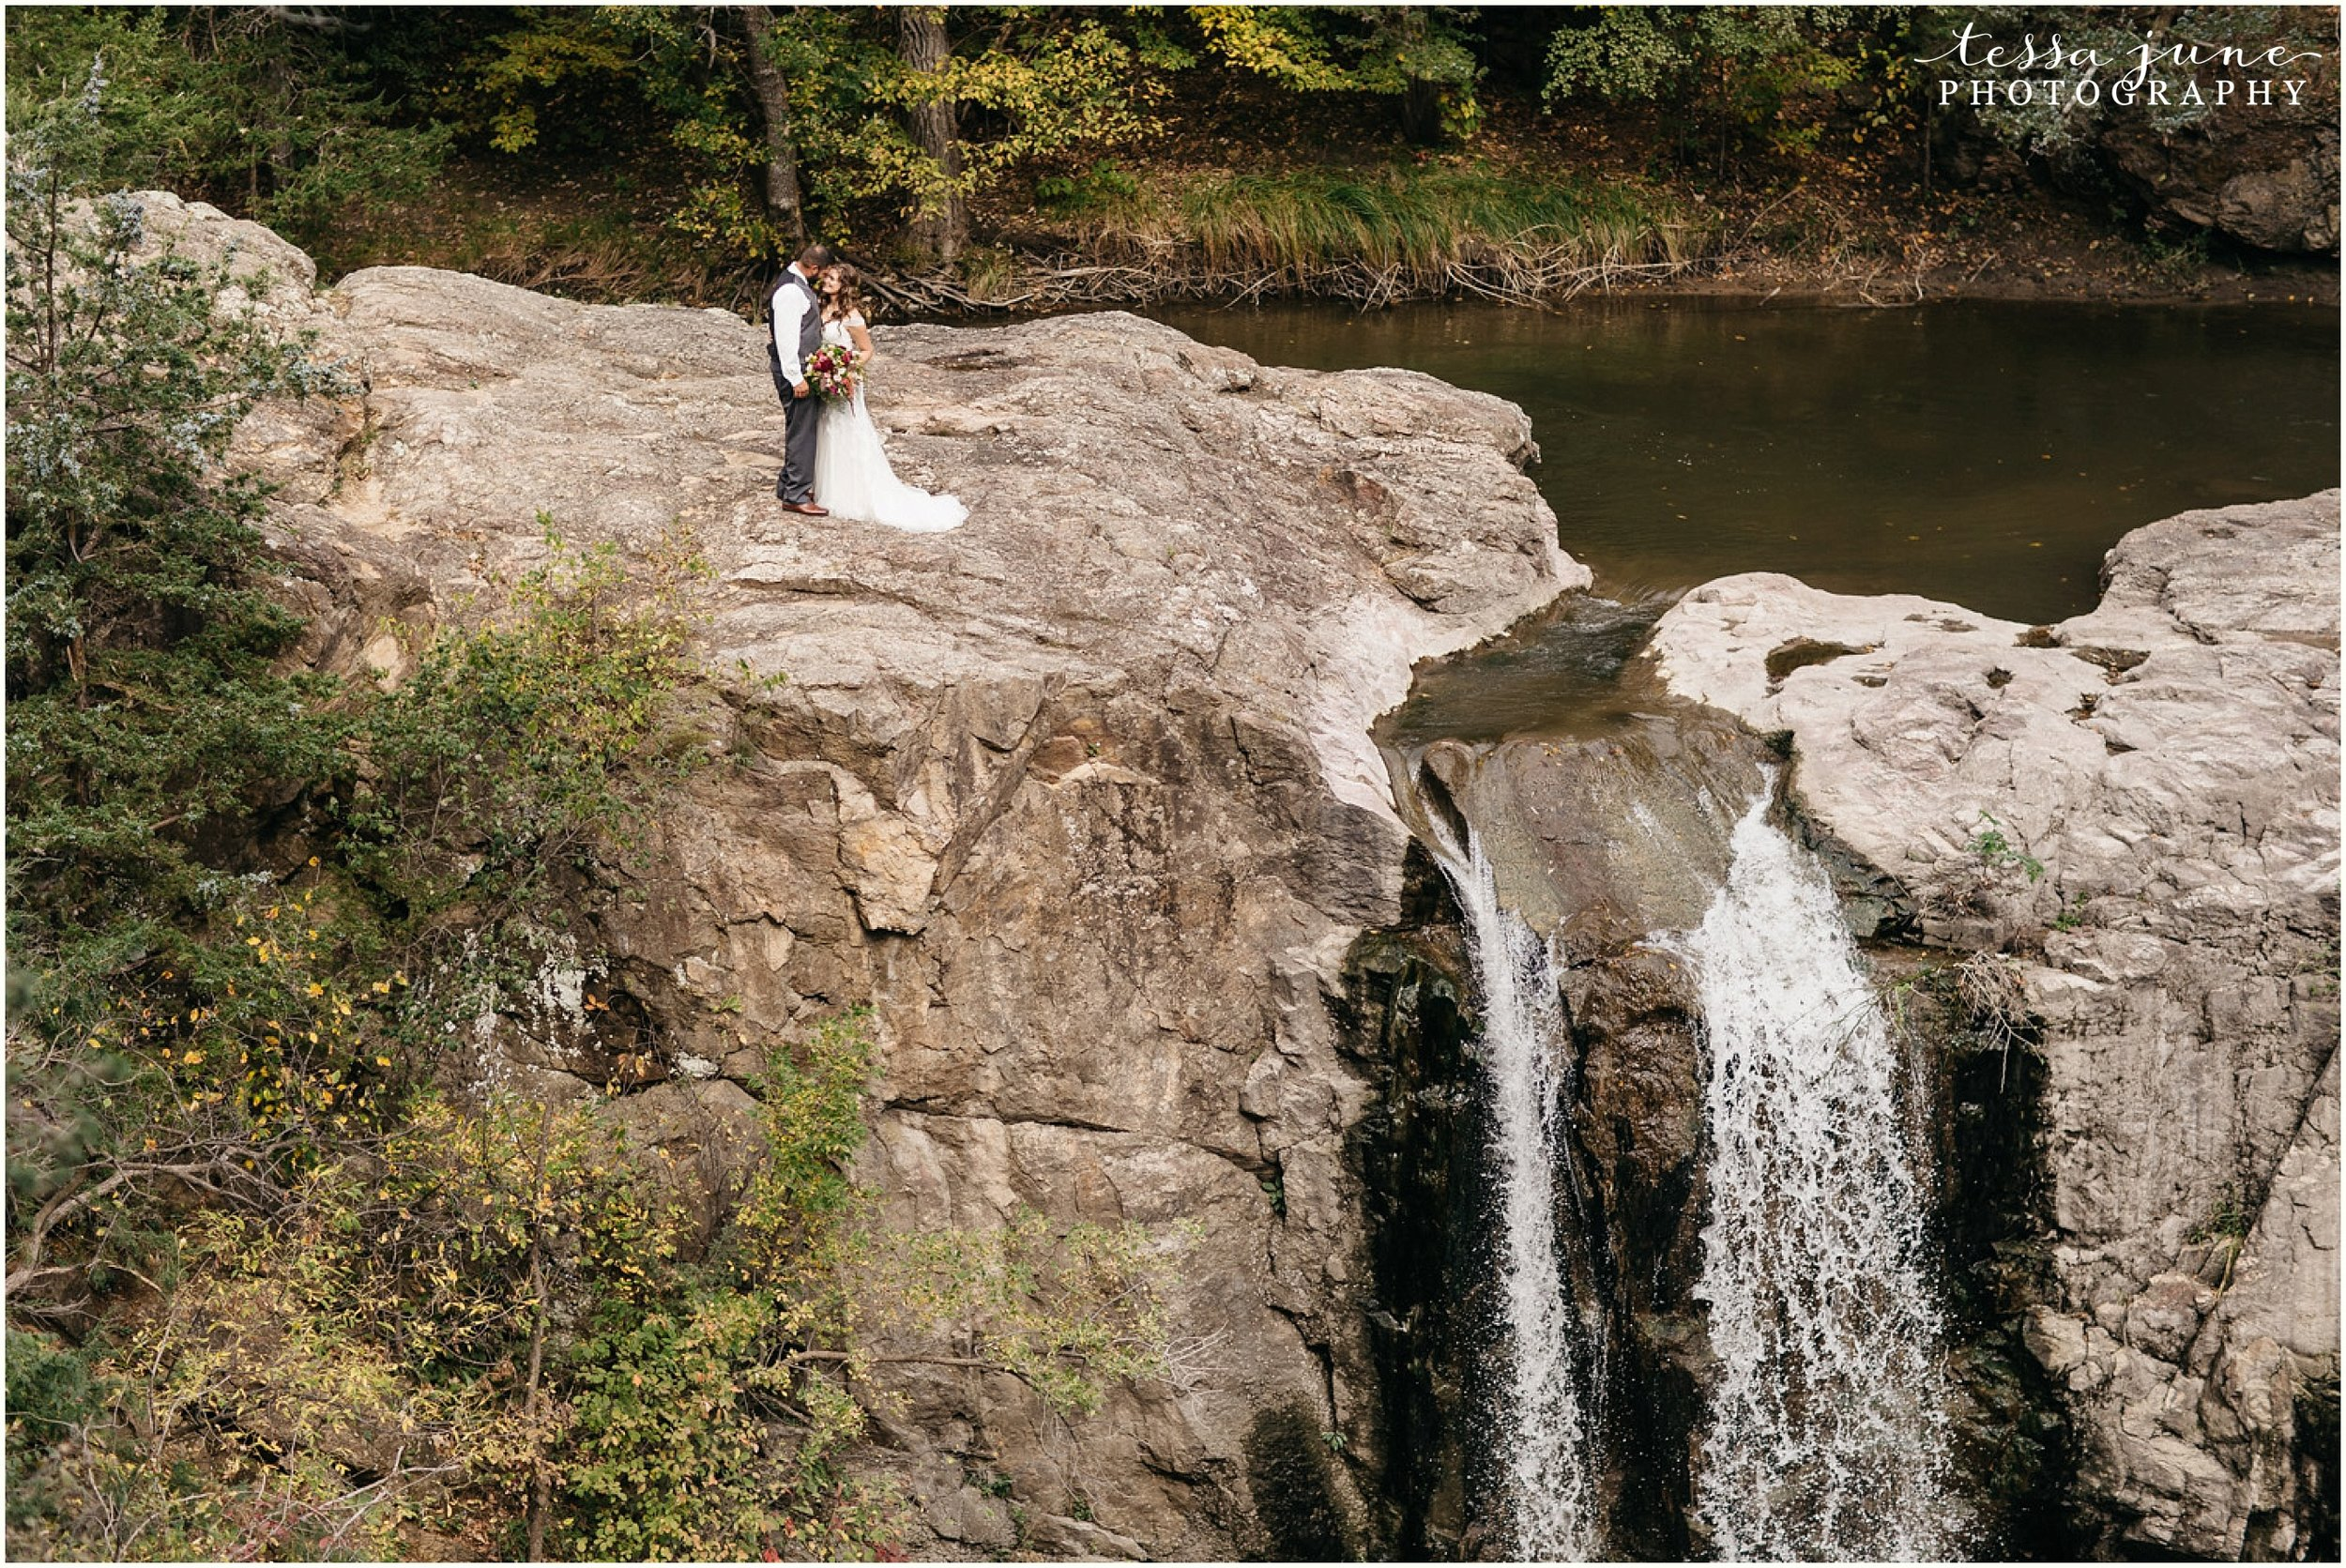 bohemian-minnesota-wedding-mismatched-bridesmaid-dresses-waterfall-st-cloud-tessa-june-photography-57.jpg